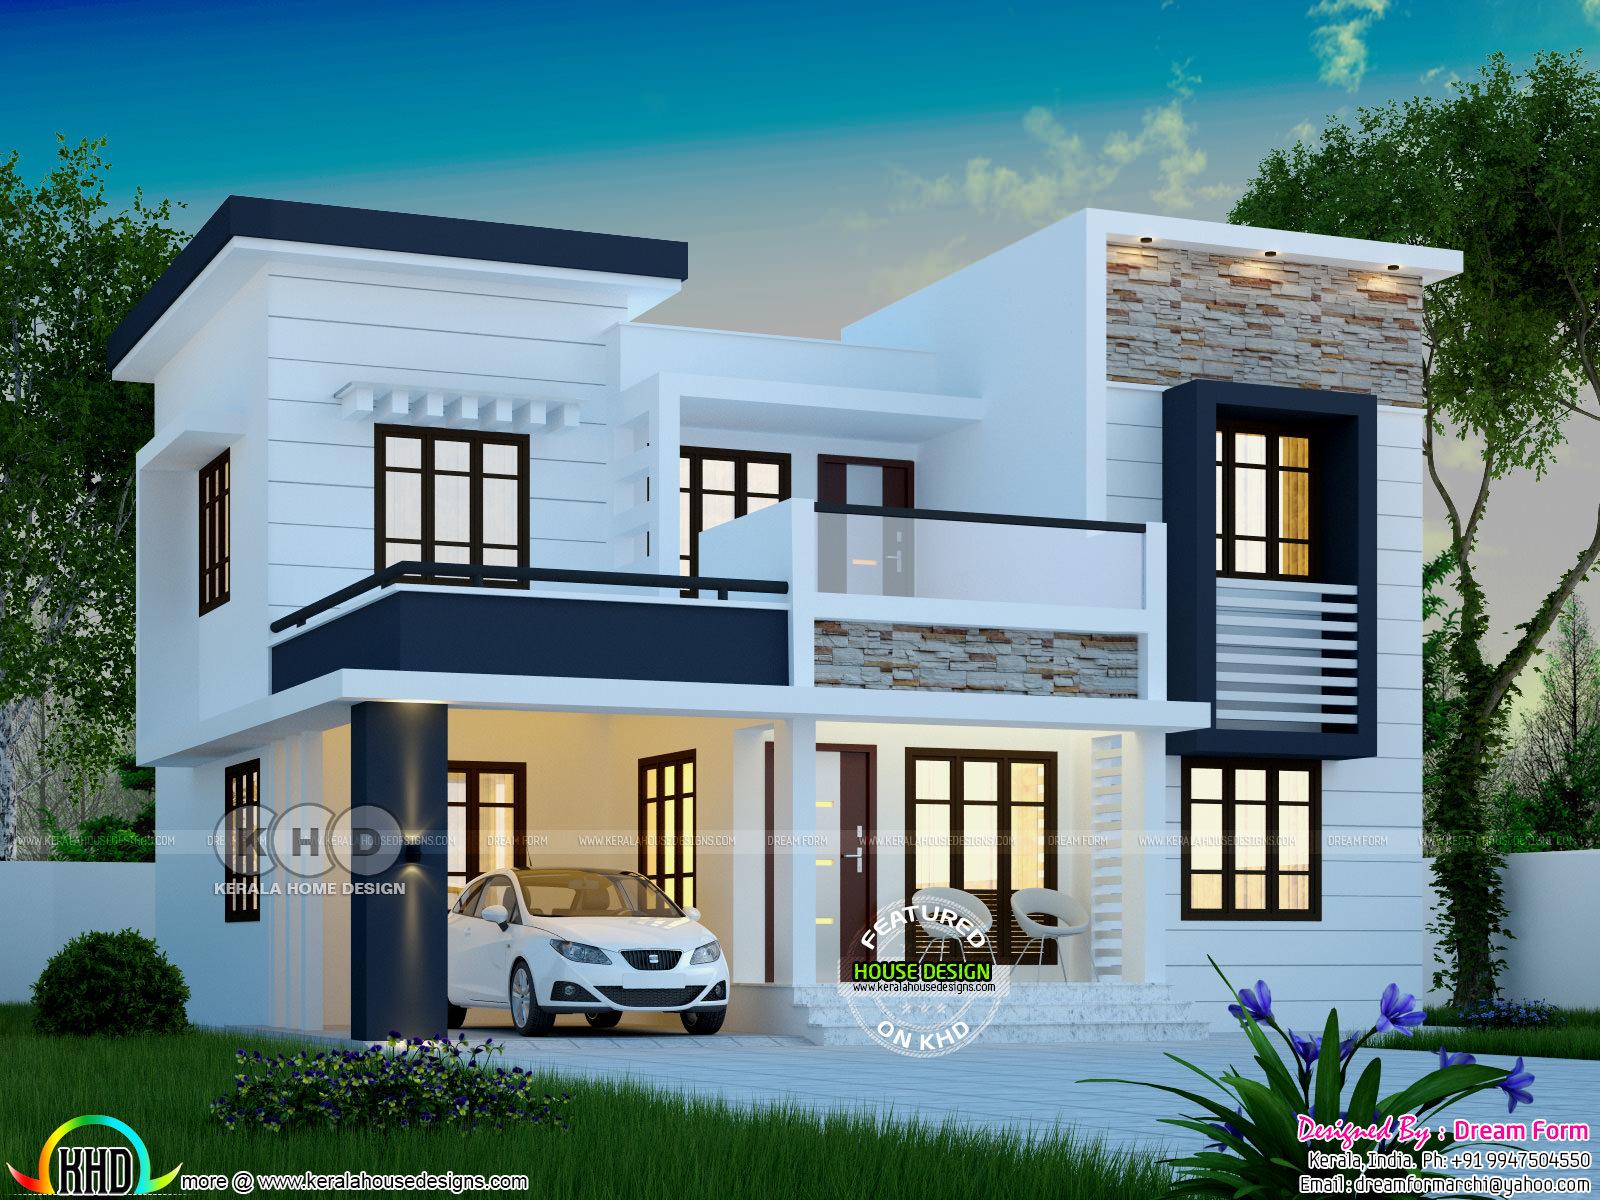 1748 square feet modern 4 bedroom house plan  Kerala home design  Bloglovin